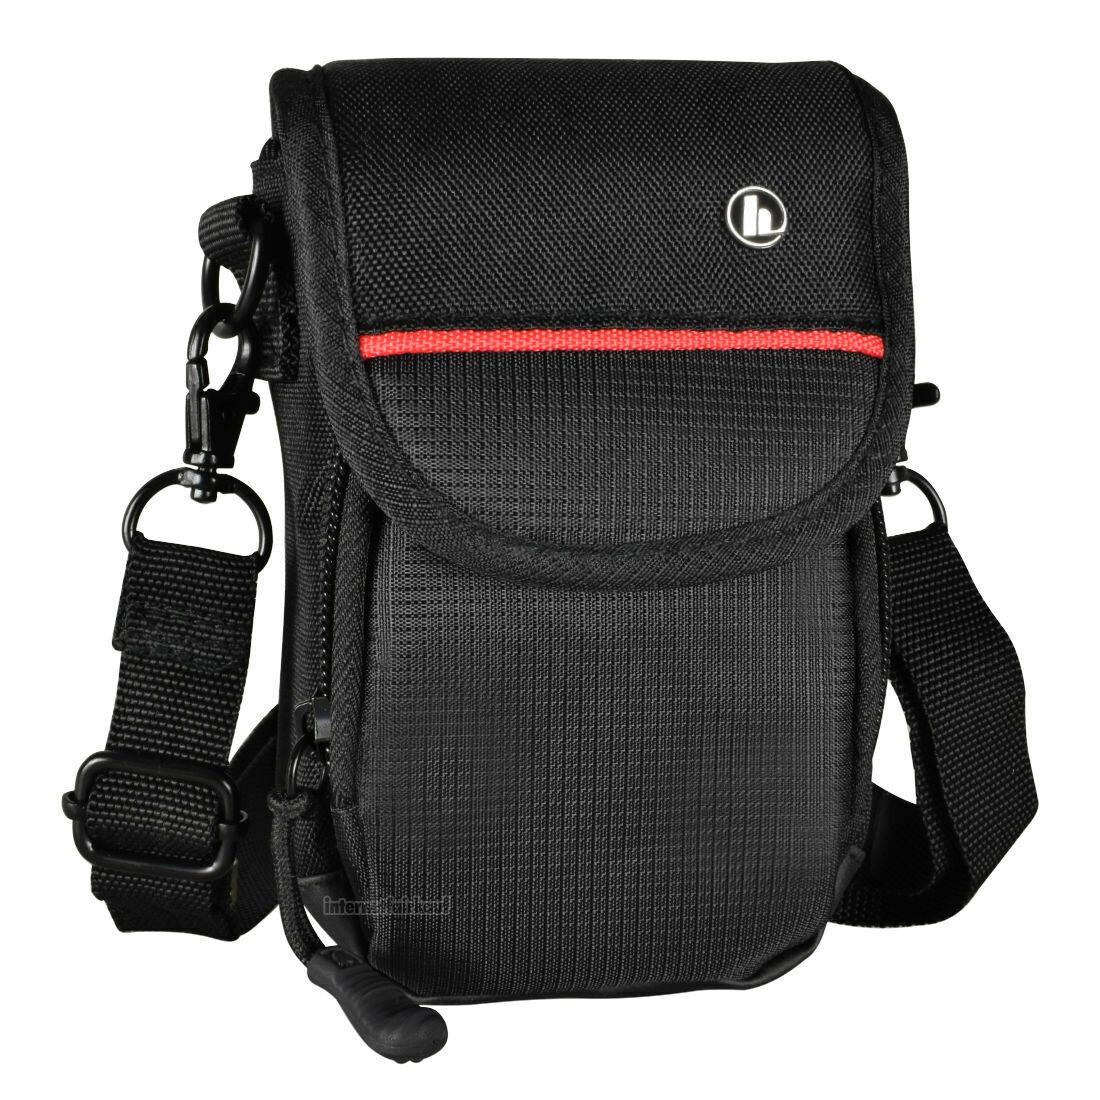 Fototasche Kameratasche passend für Panasonic Lumix DMC-LX5 LX7 LX15